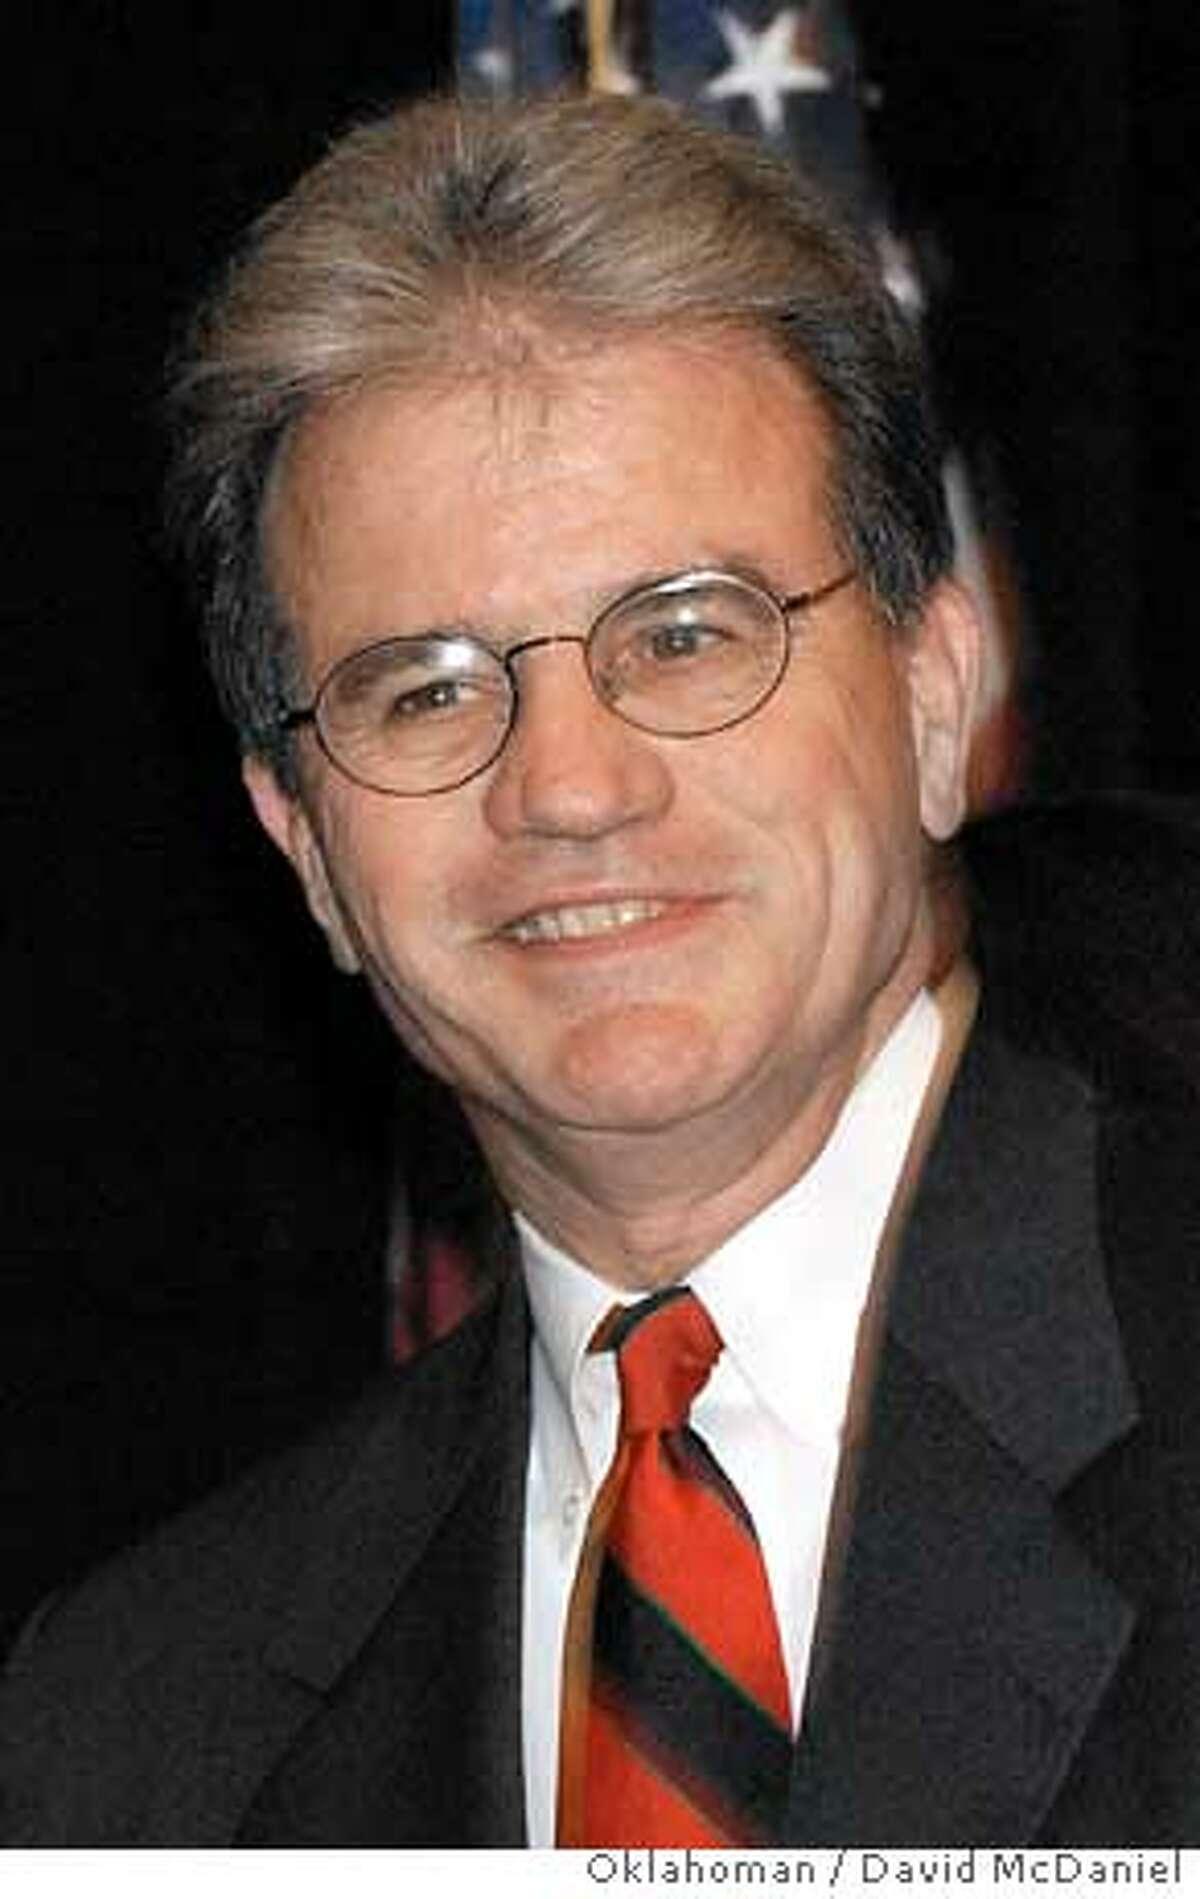 U.S. Senate candidate Tom Coburn smiles at his watch party in Tulsa, Tuesday night, Nov. 2, 2004. (AP Photo/The Oklahoman, David McDaniel)